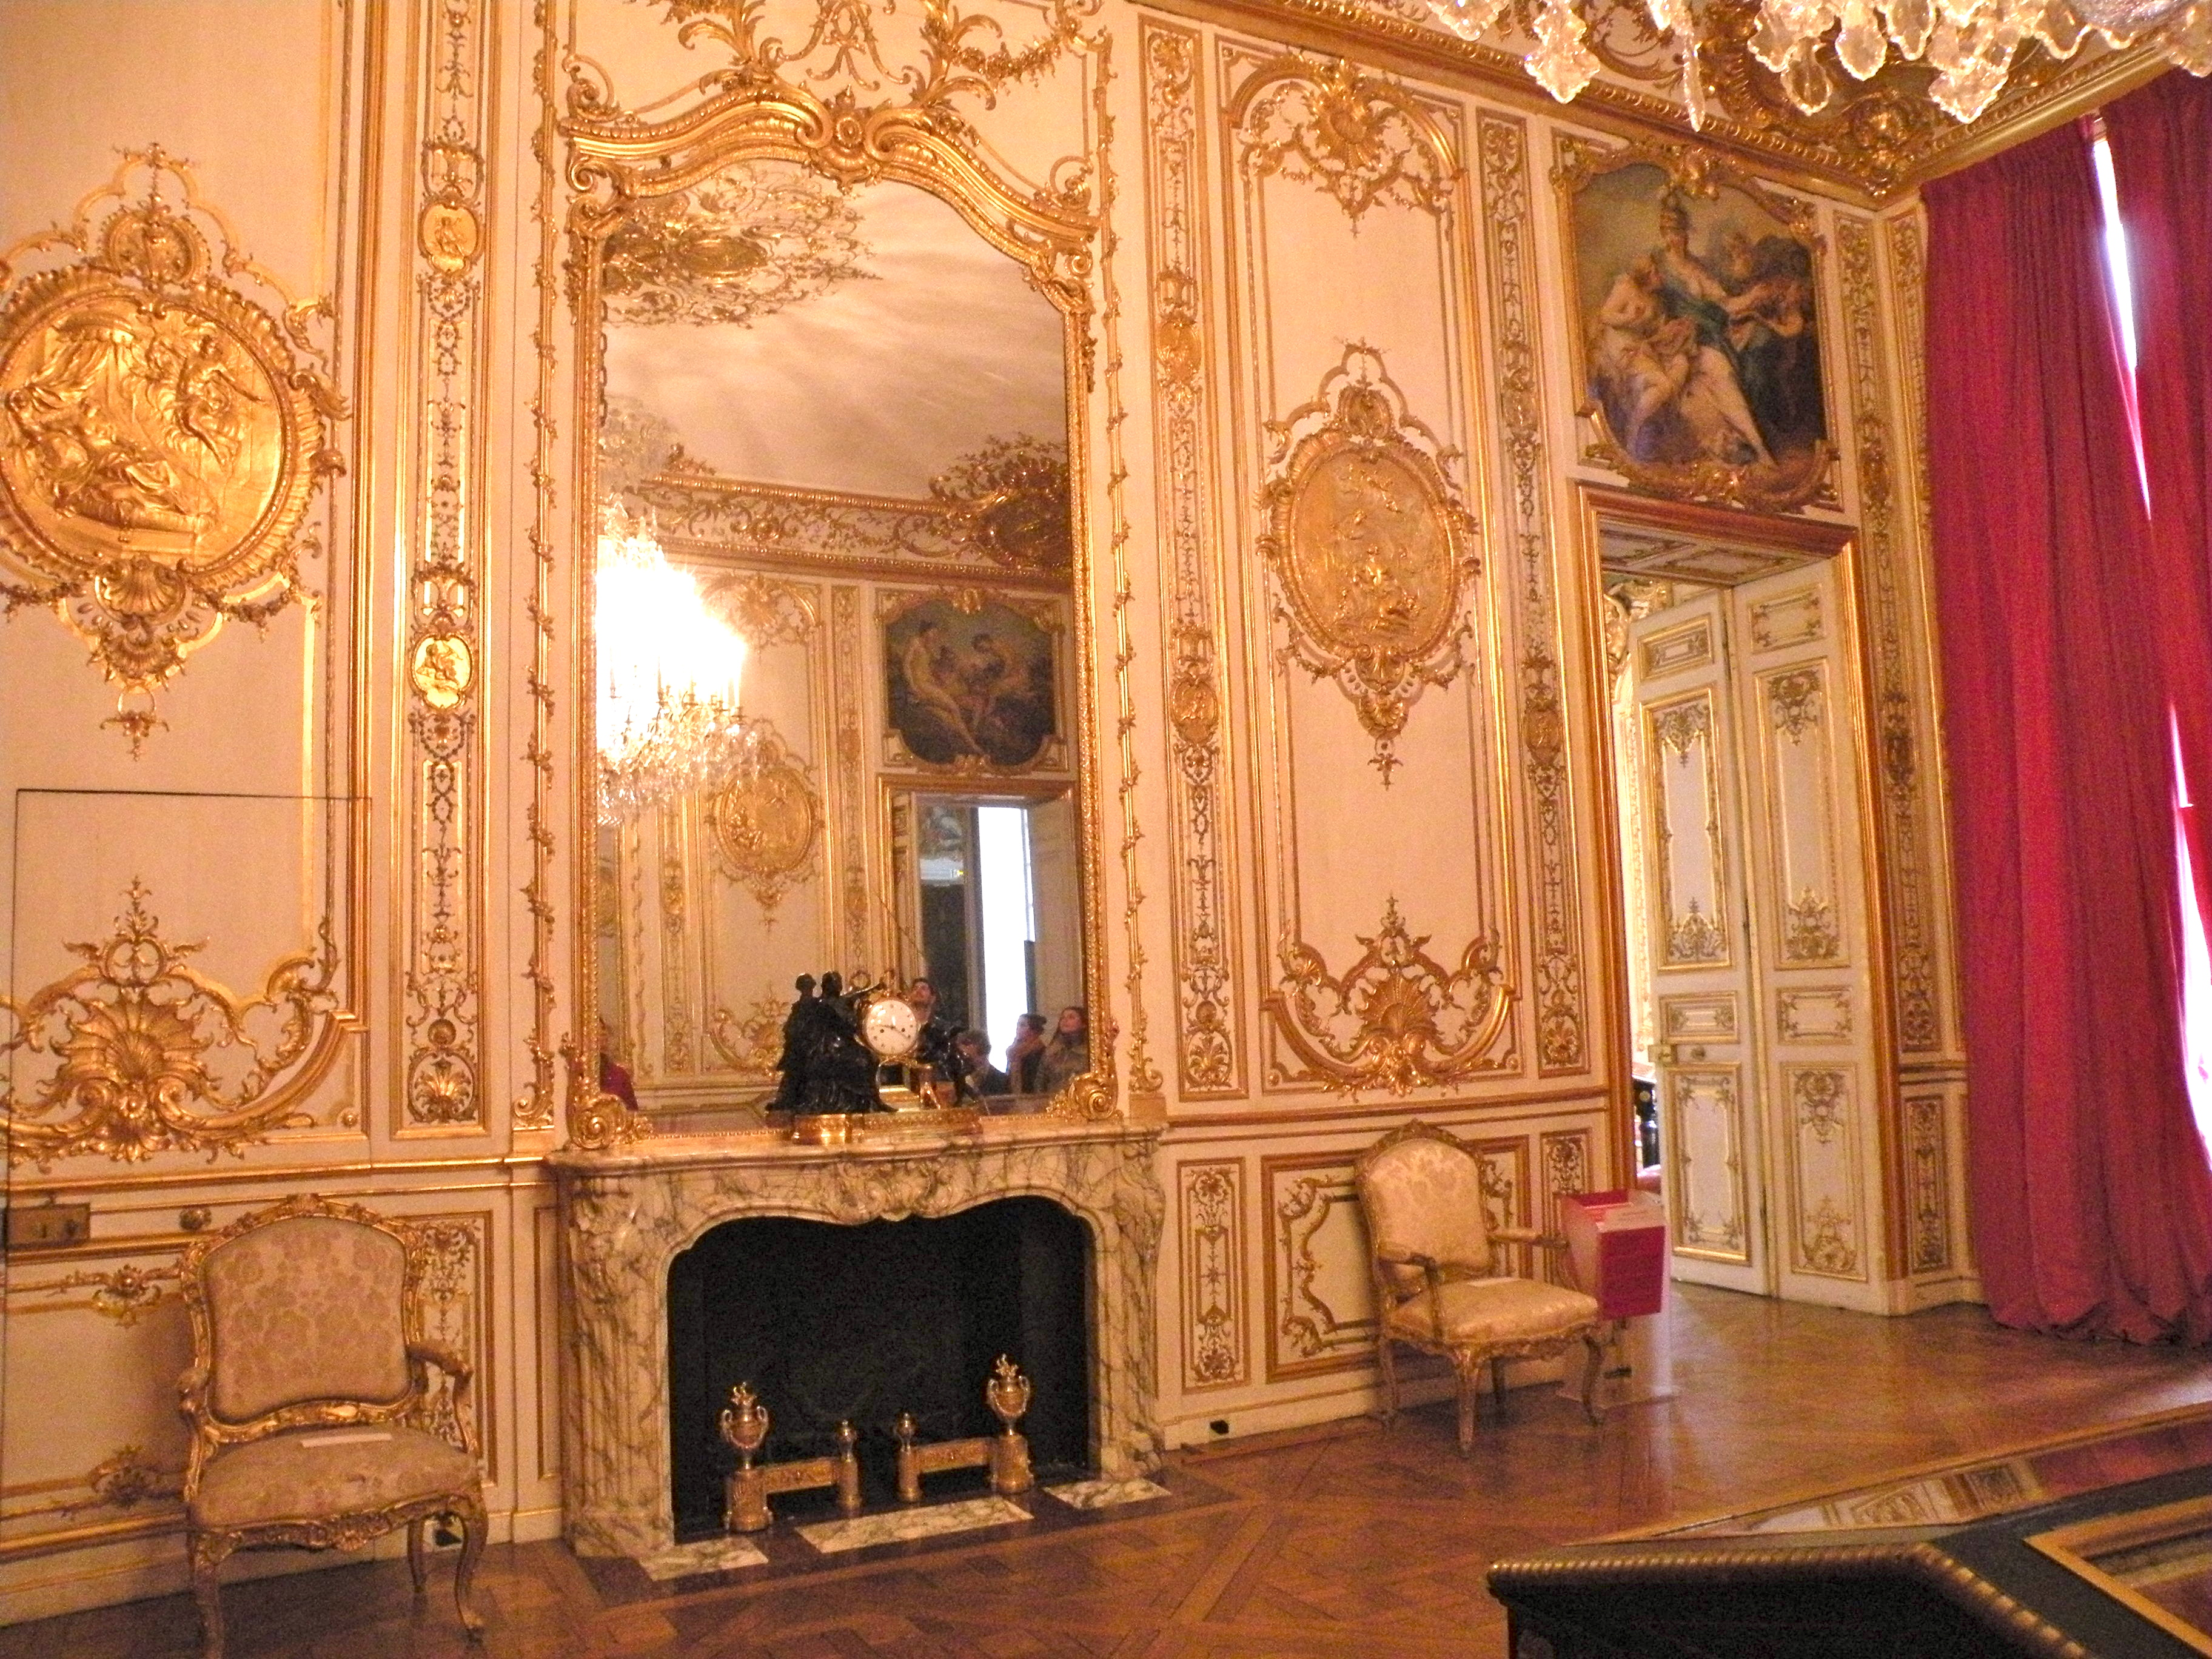 FileHotel de Soubise  Grande chambre de la princesse 3JPG  Wikimedia Commons